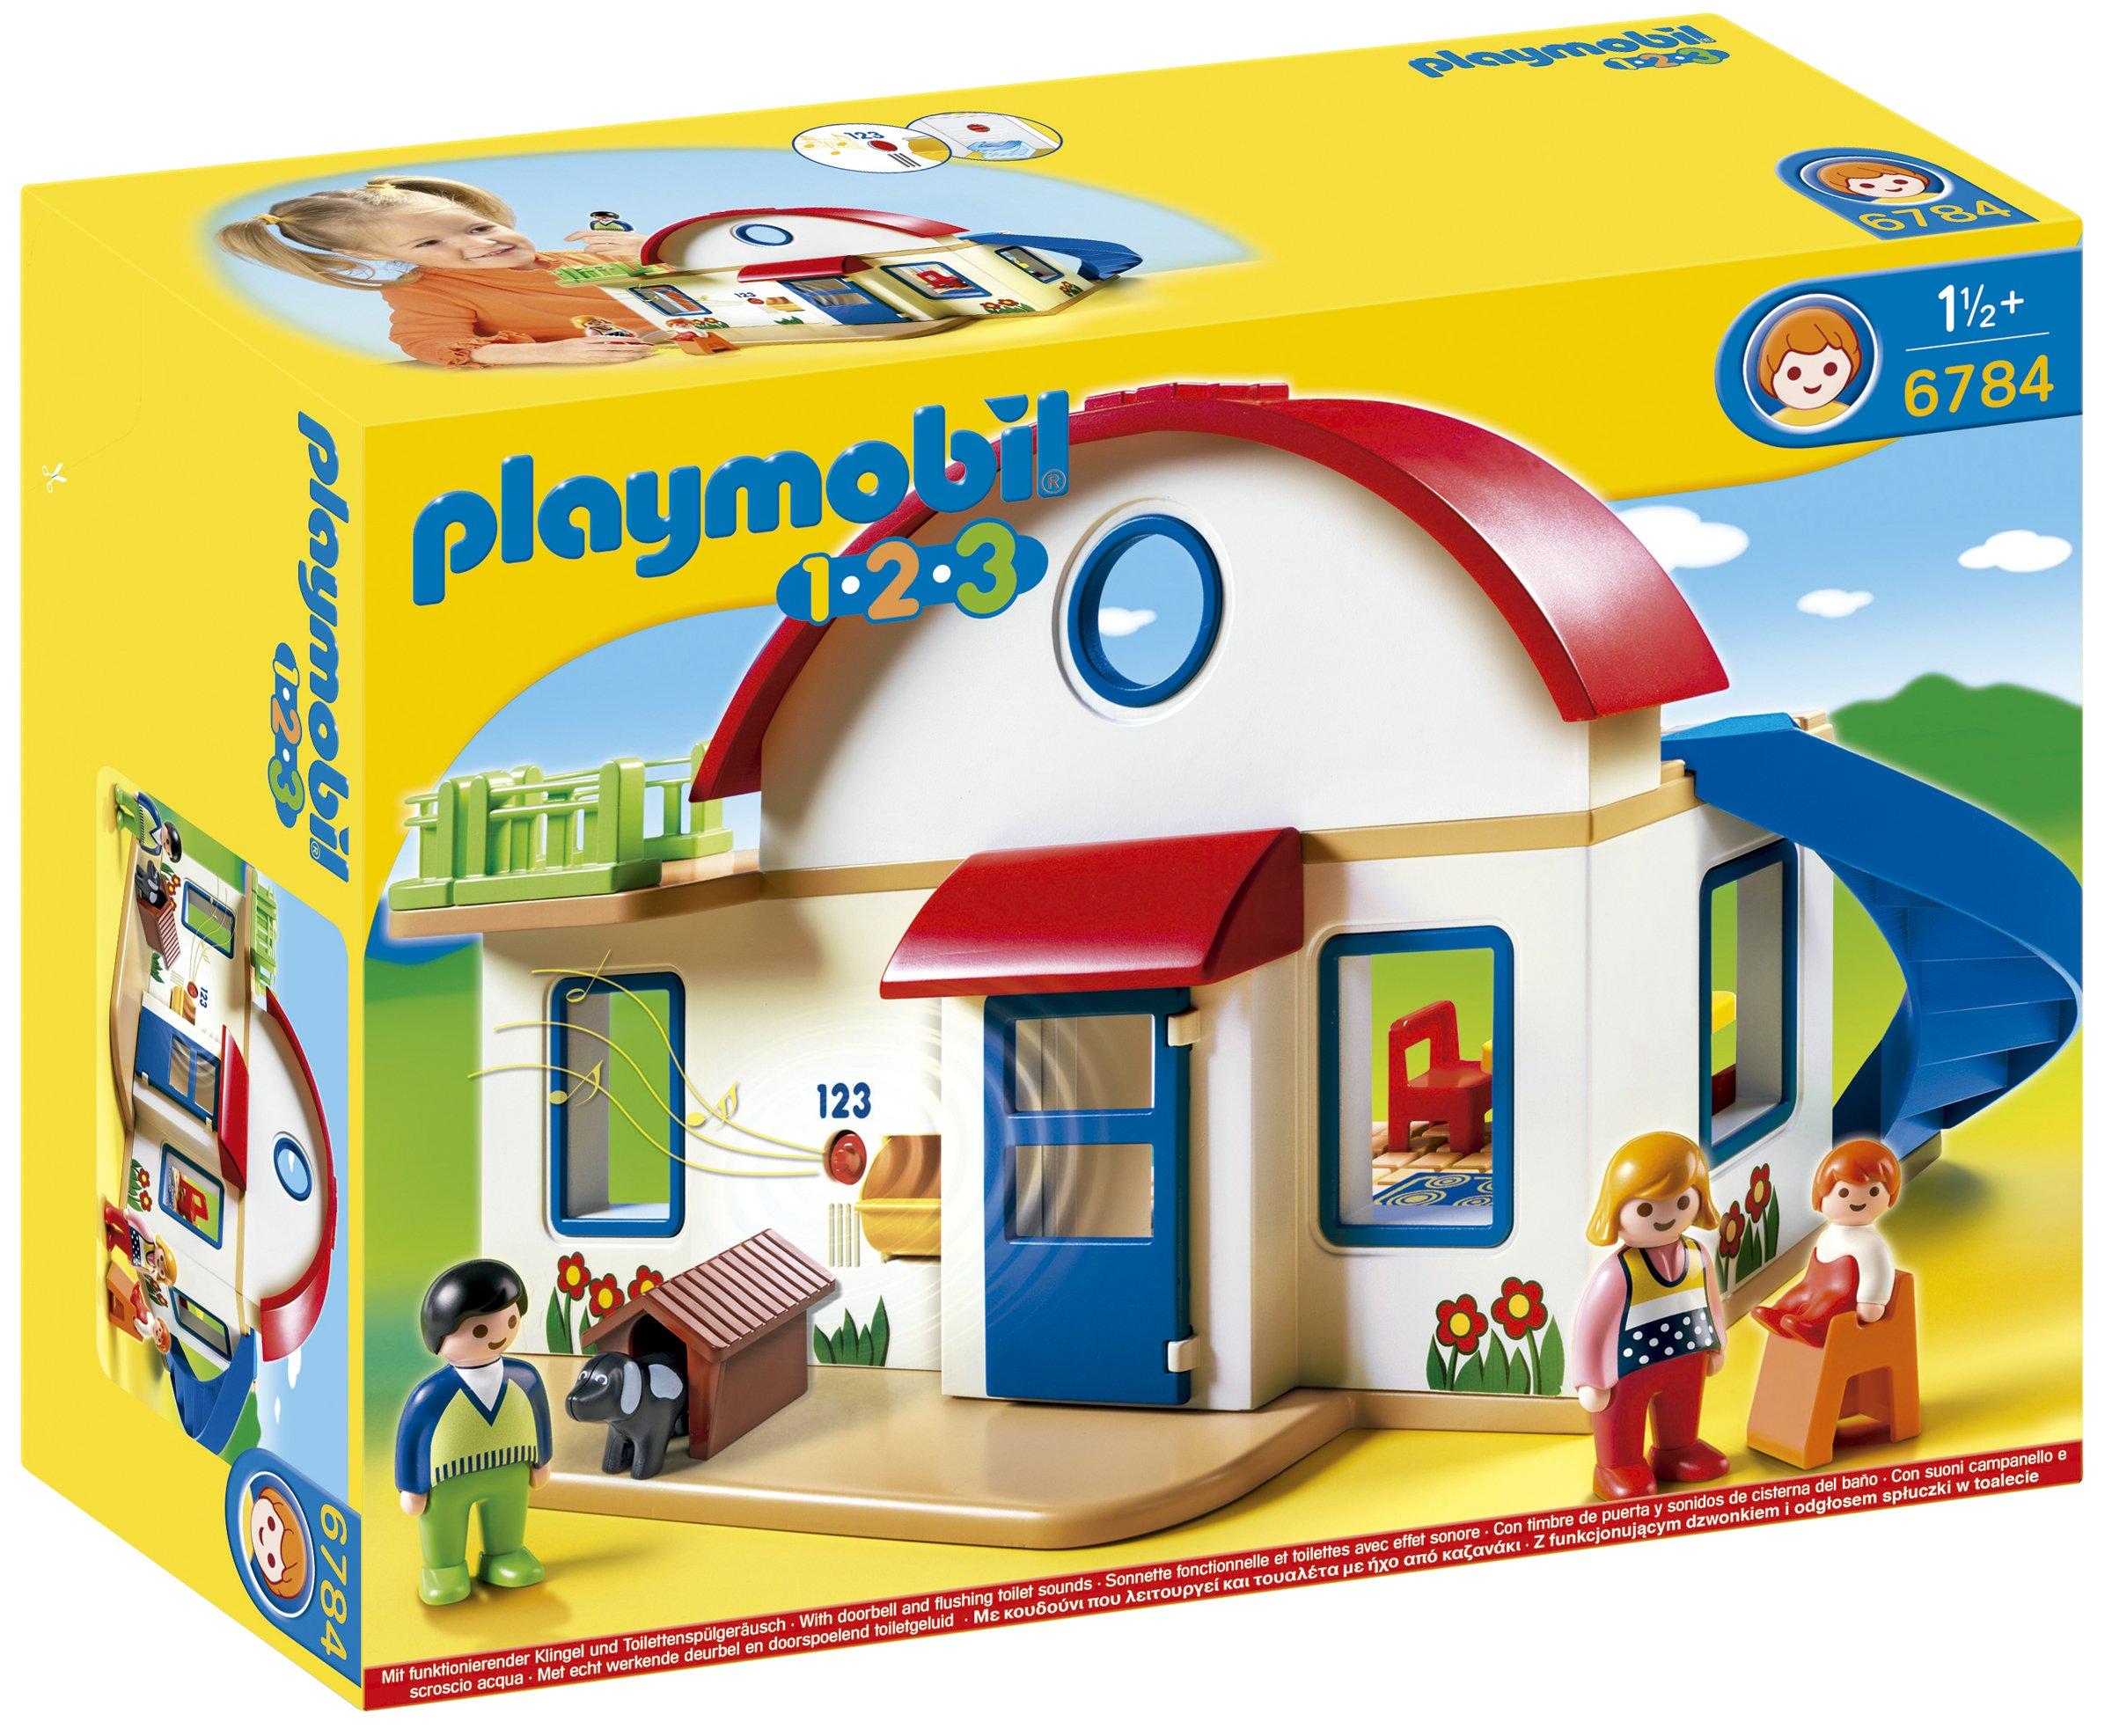 Playmobil 6784 Casetta 1 2 3 EBay #BFA70C 2400 1973 Sala Da Pranzo Radica Di Noce